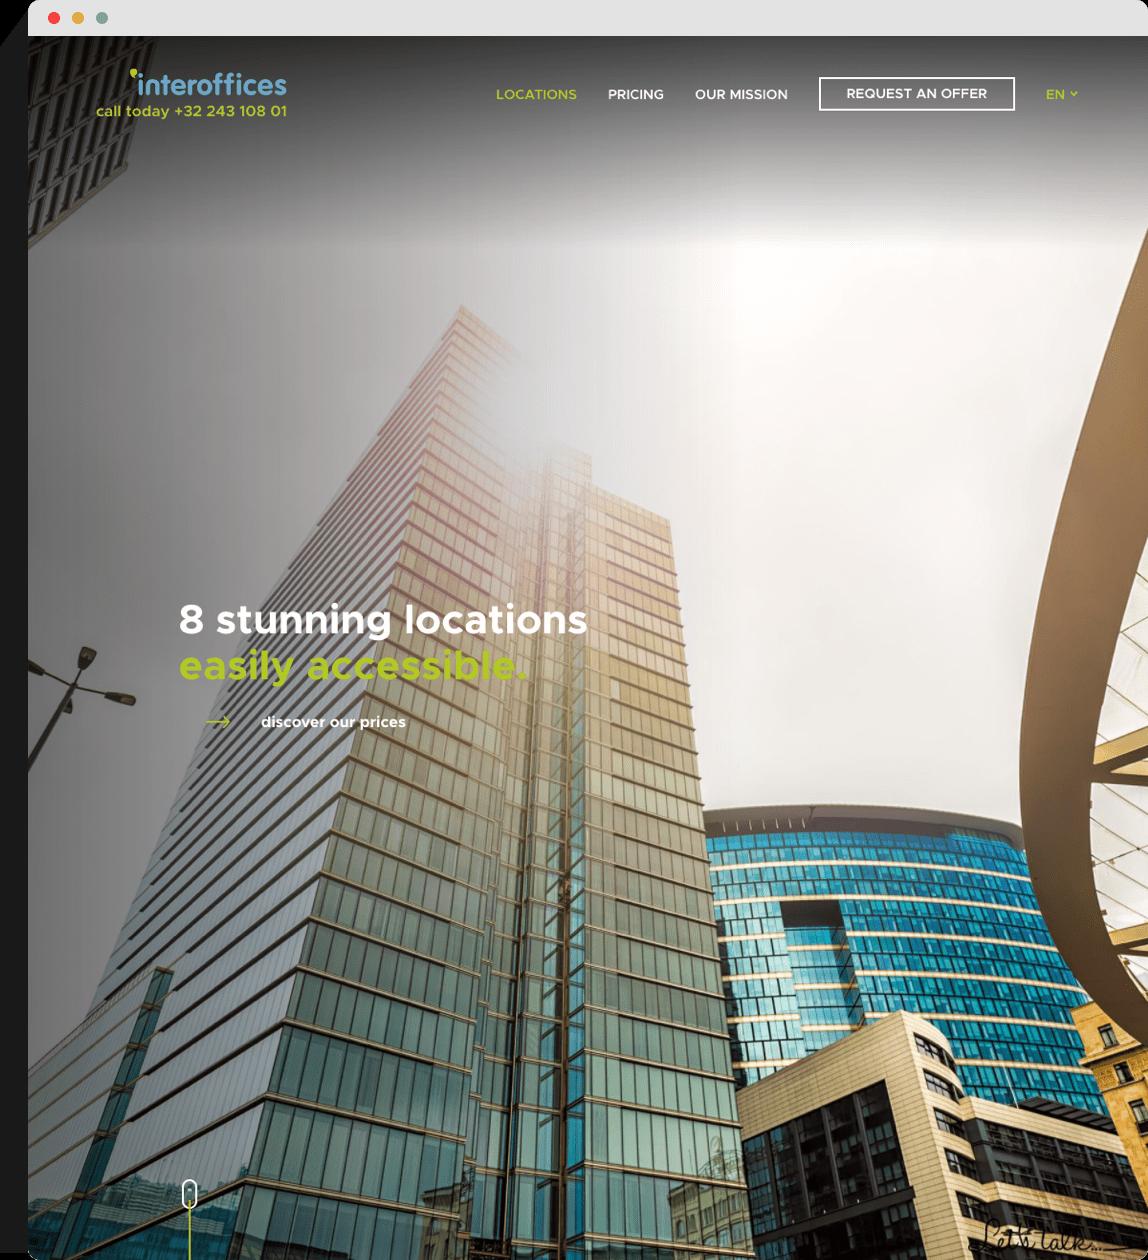 webdesign-Interoffices-desktop-2.png